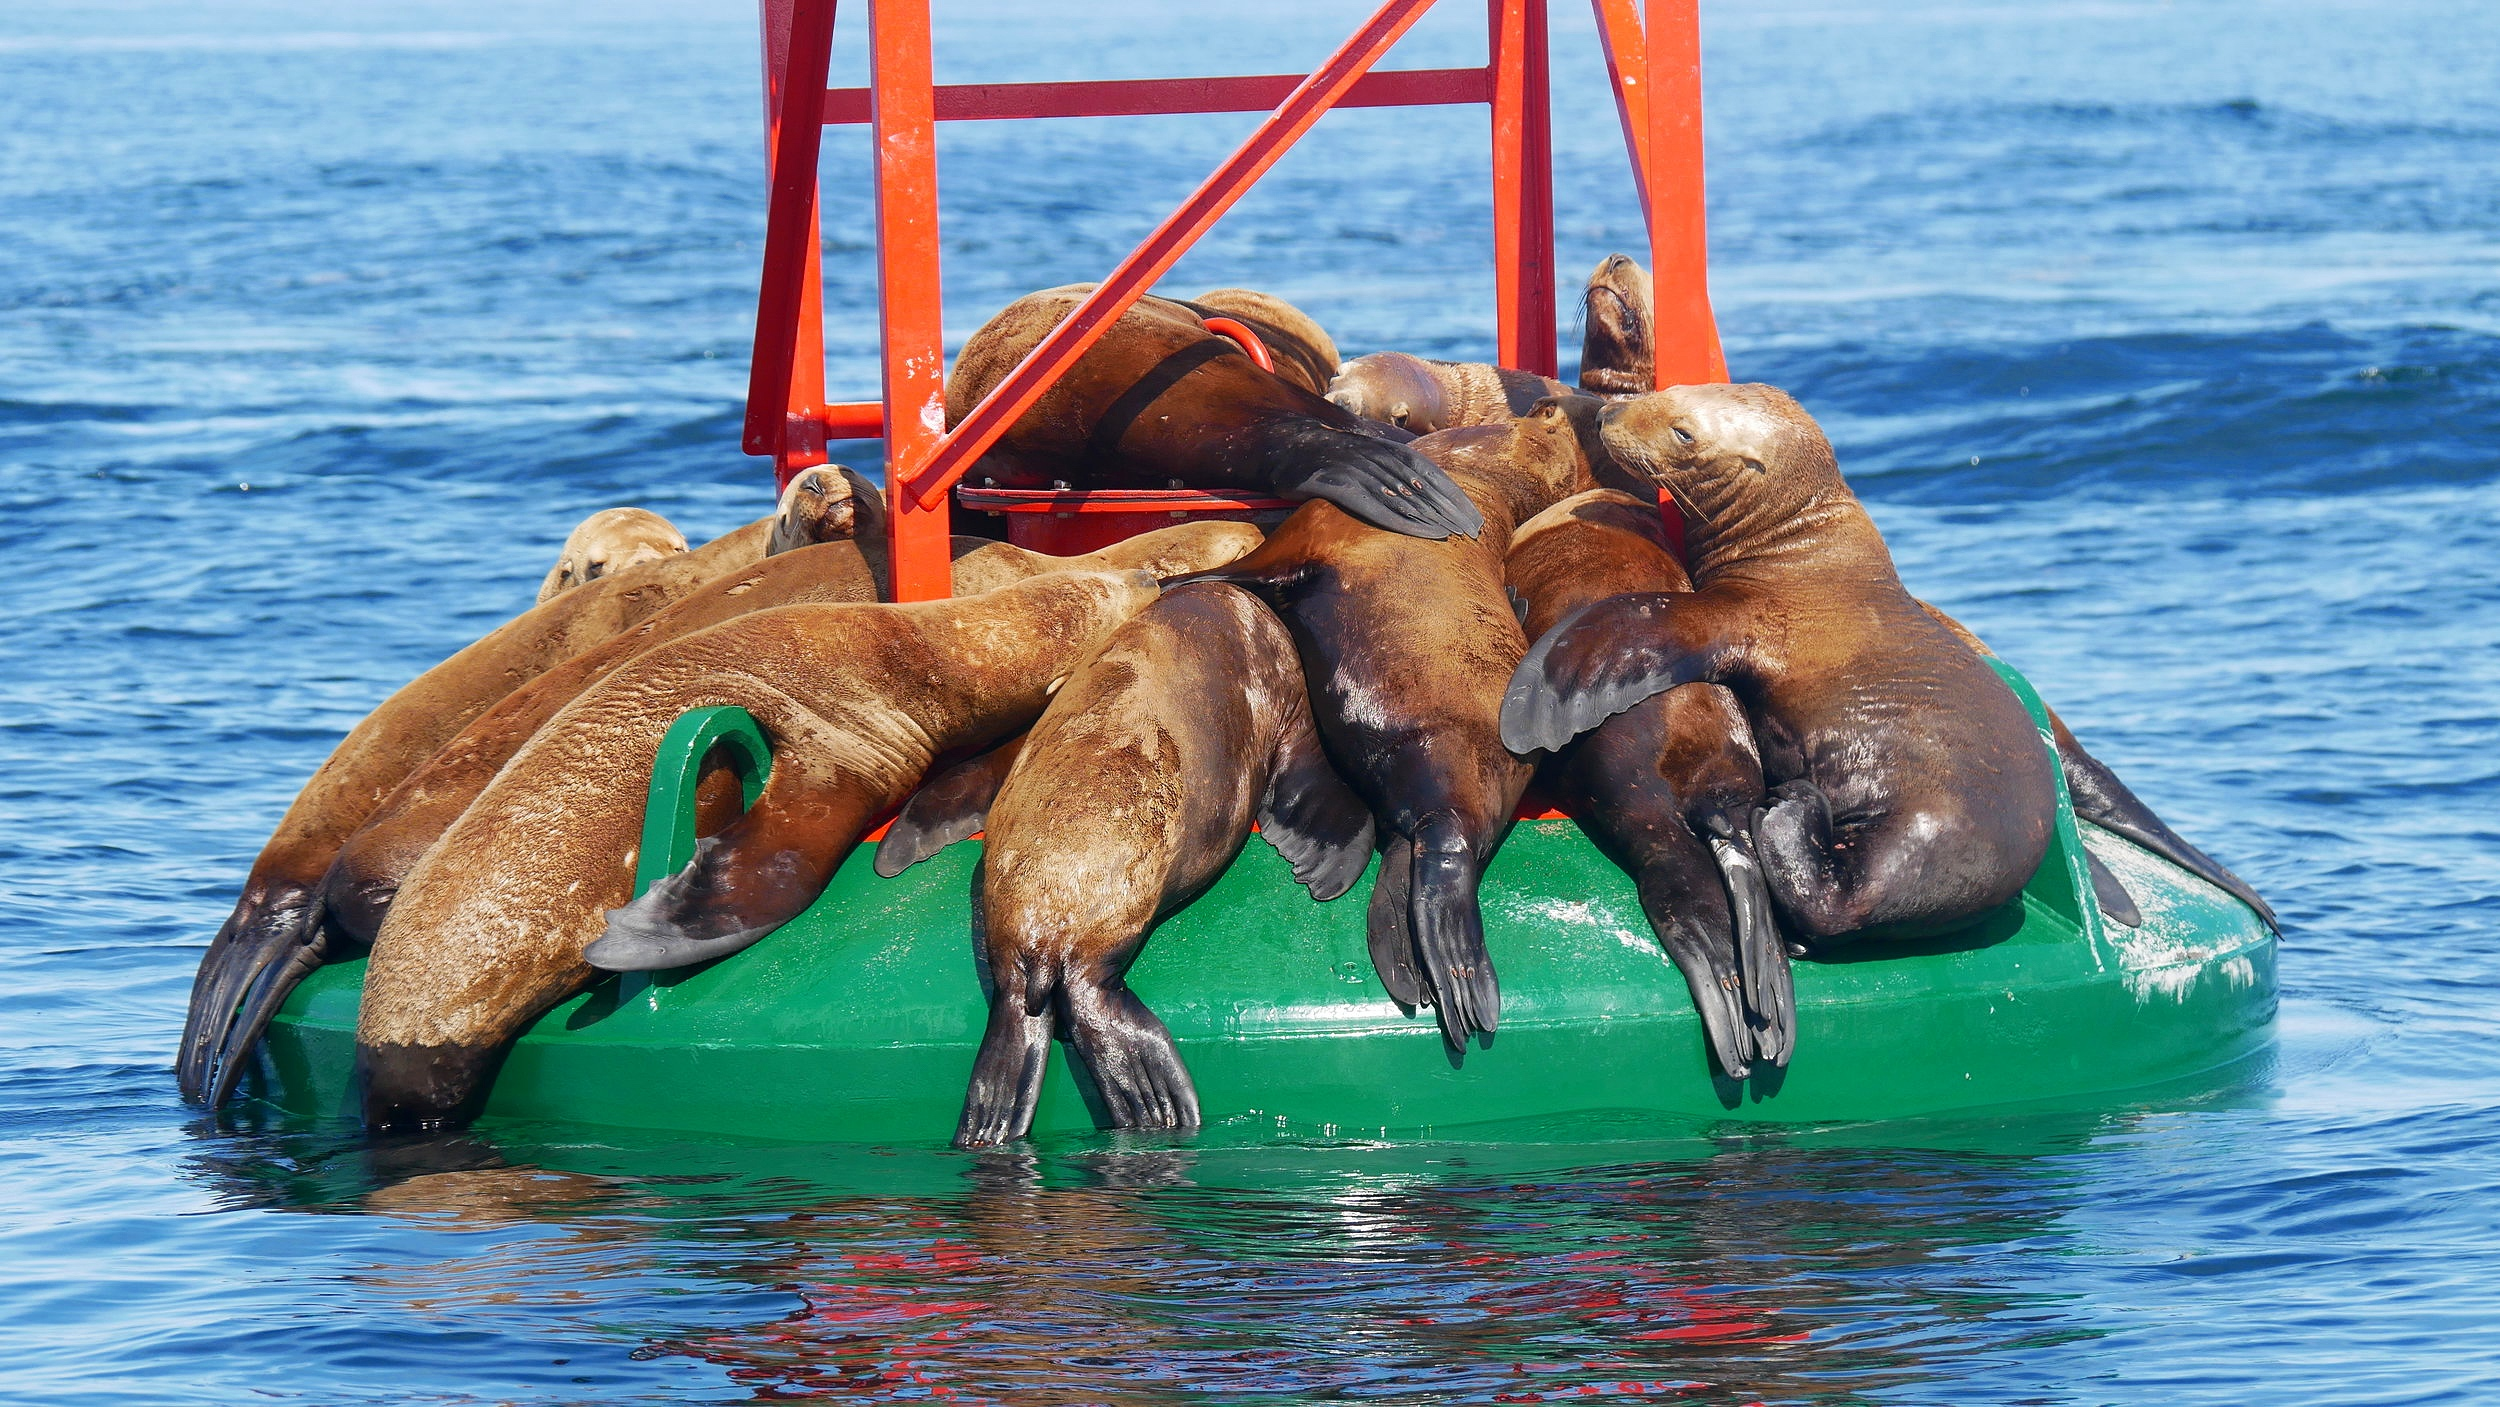 Steller Sea Lion cuddle puddle. Photo by Alanna Vivani (3.30)